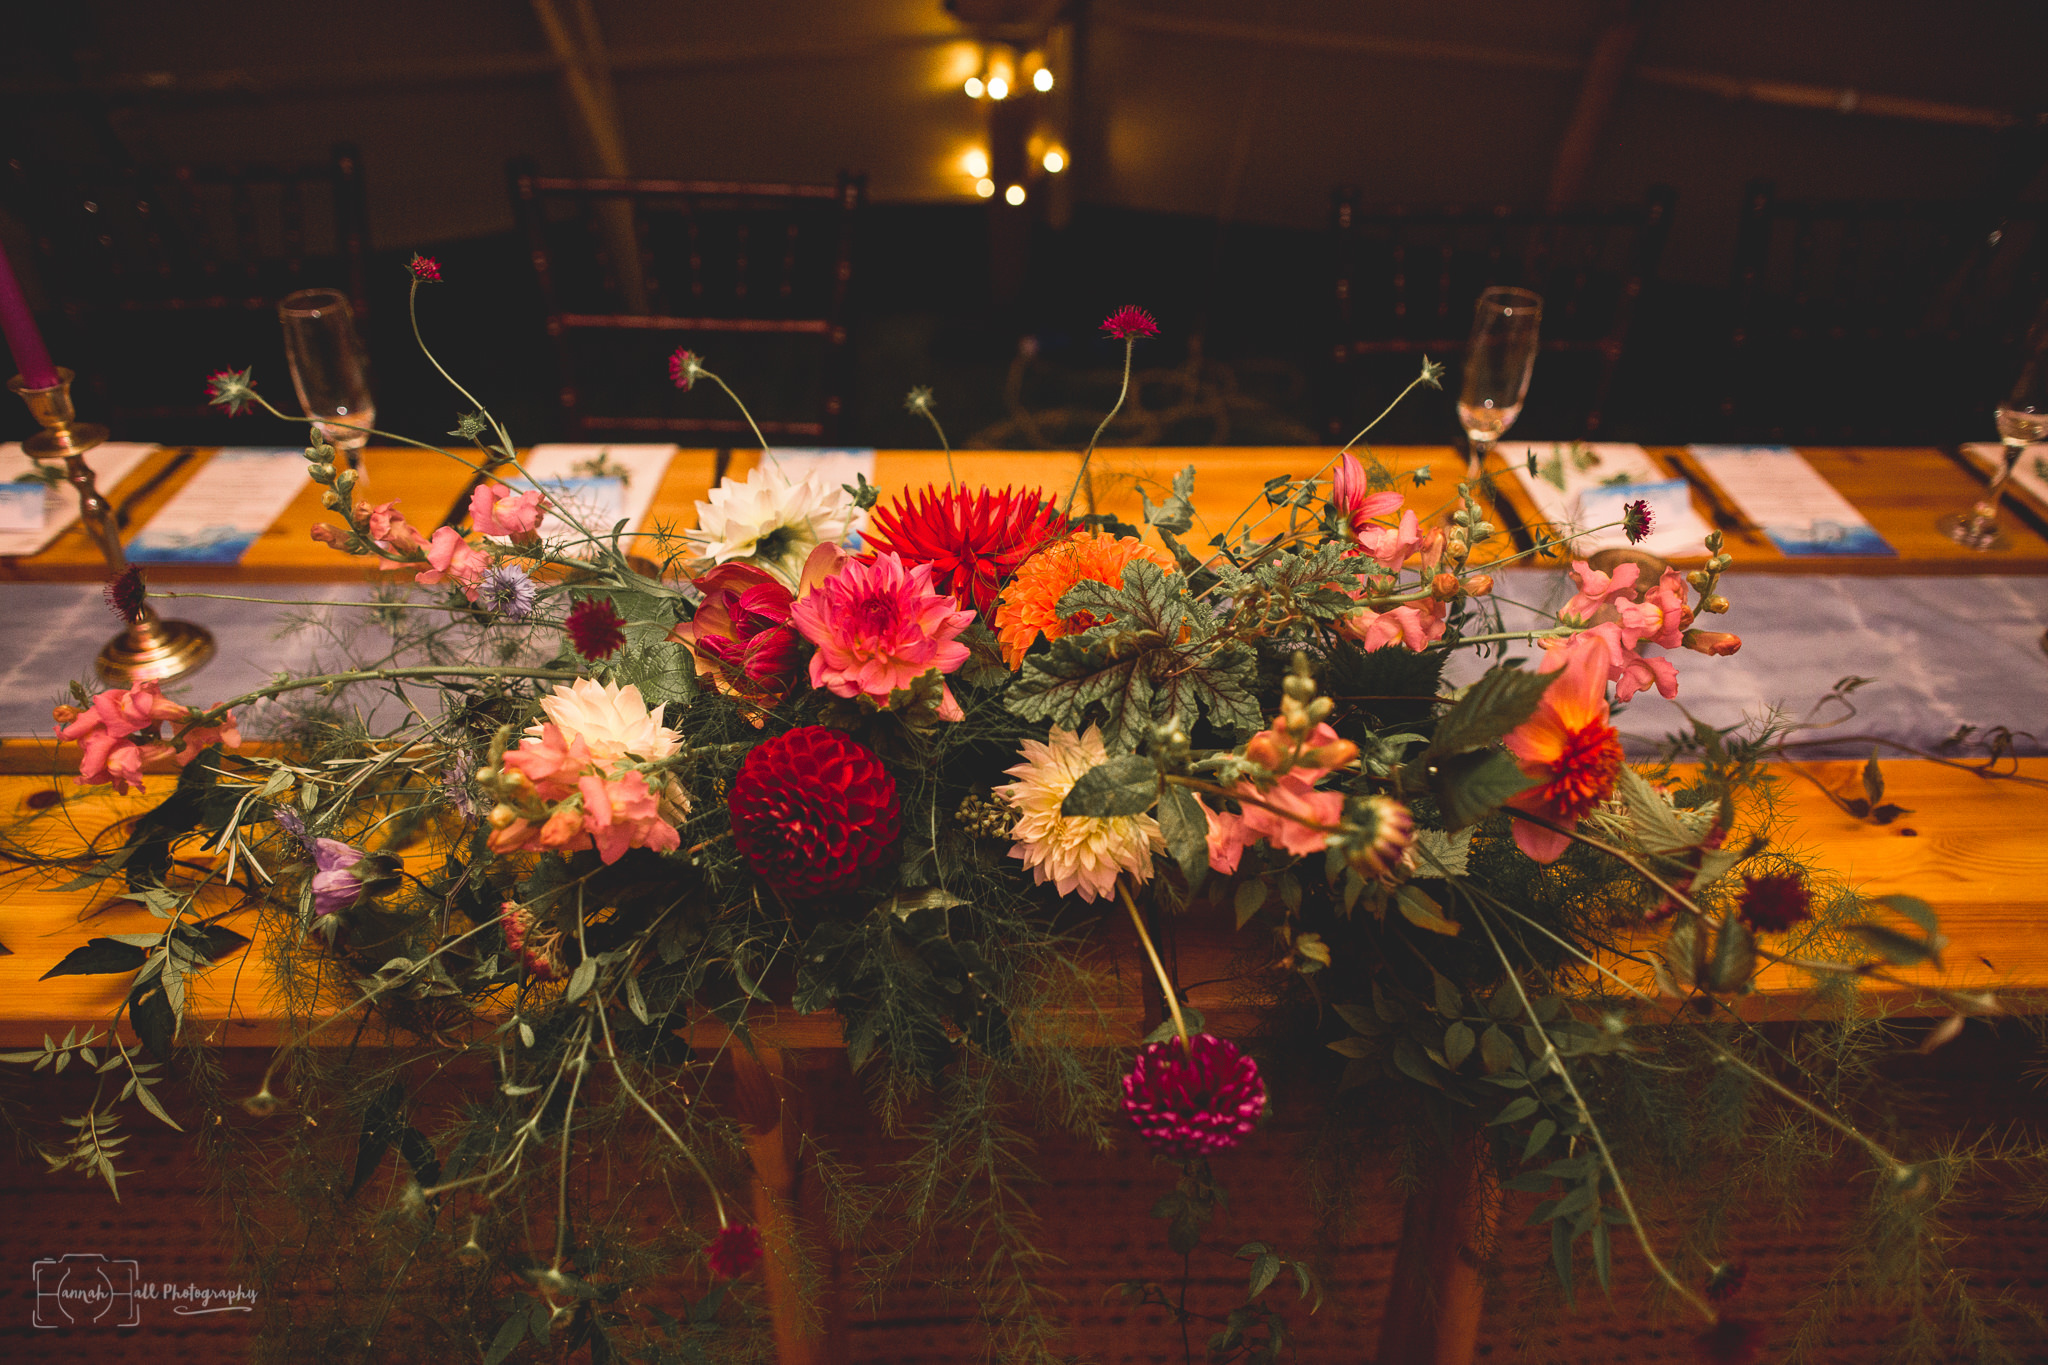 hhp_derbyshire_wedding_photographer-8